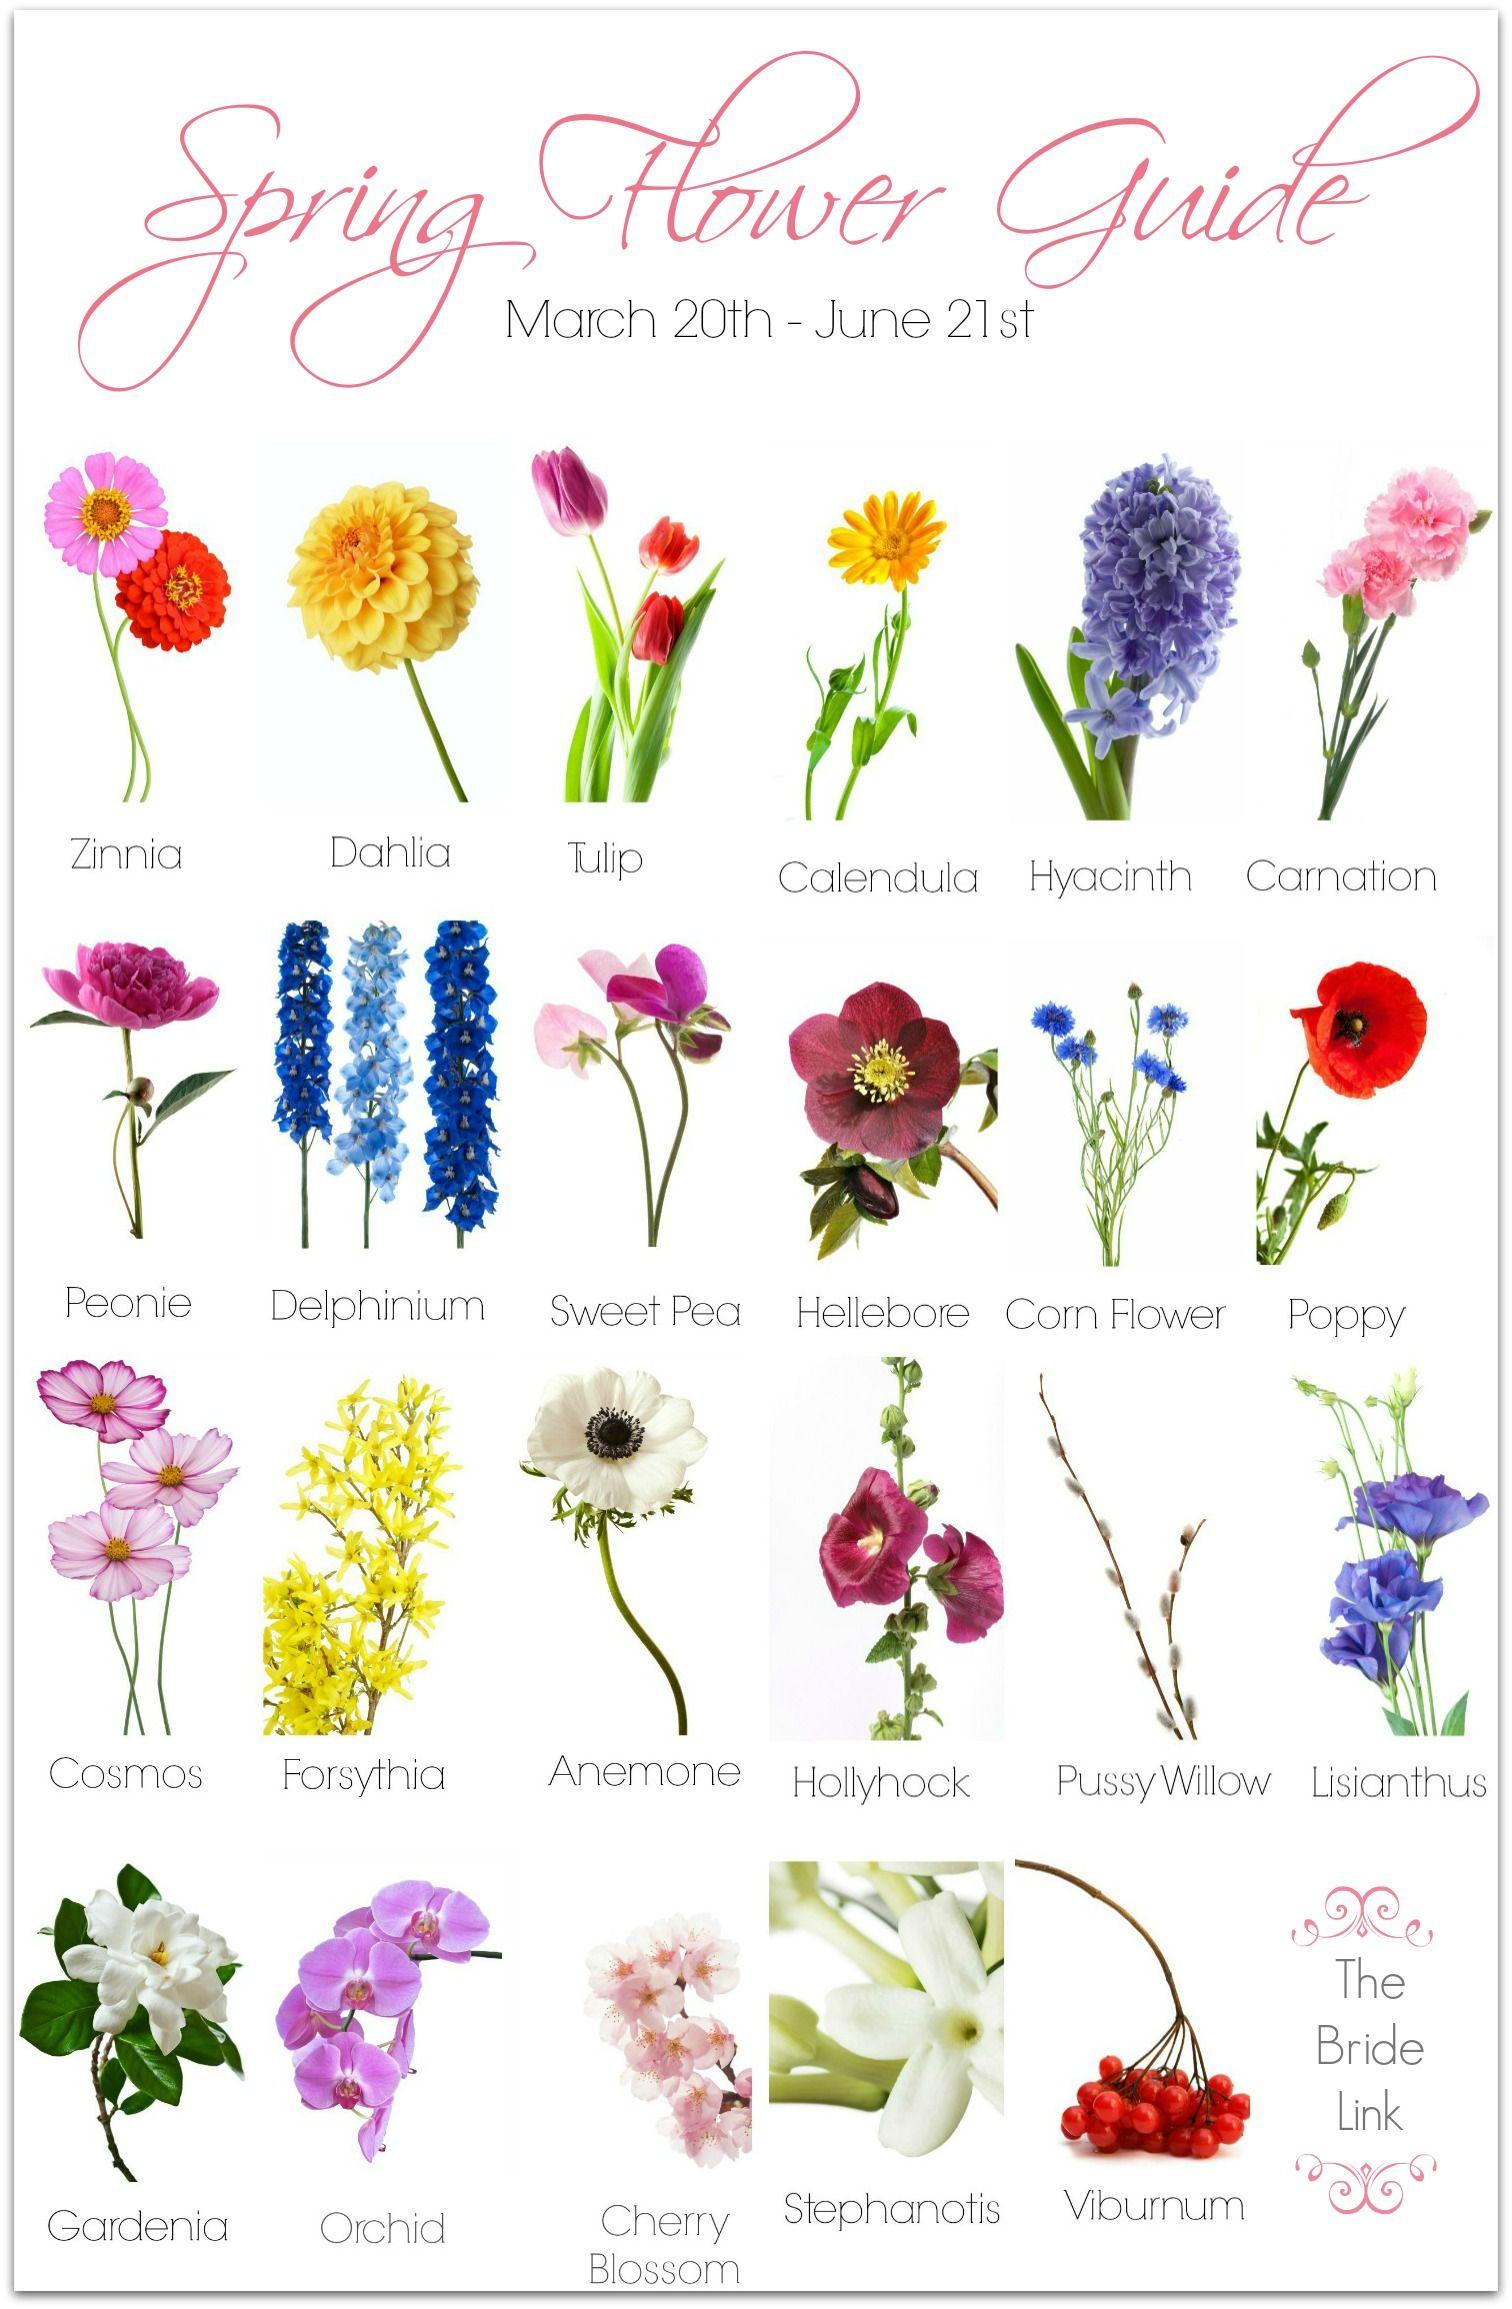 Spring Wedding Flower Guide | Spring wedding flowers, Spring ...